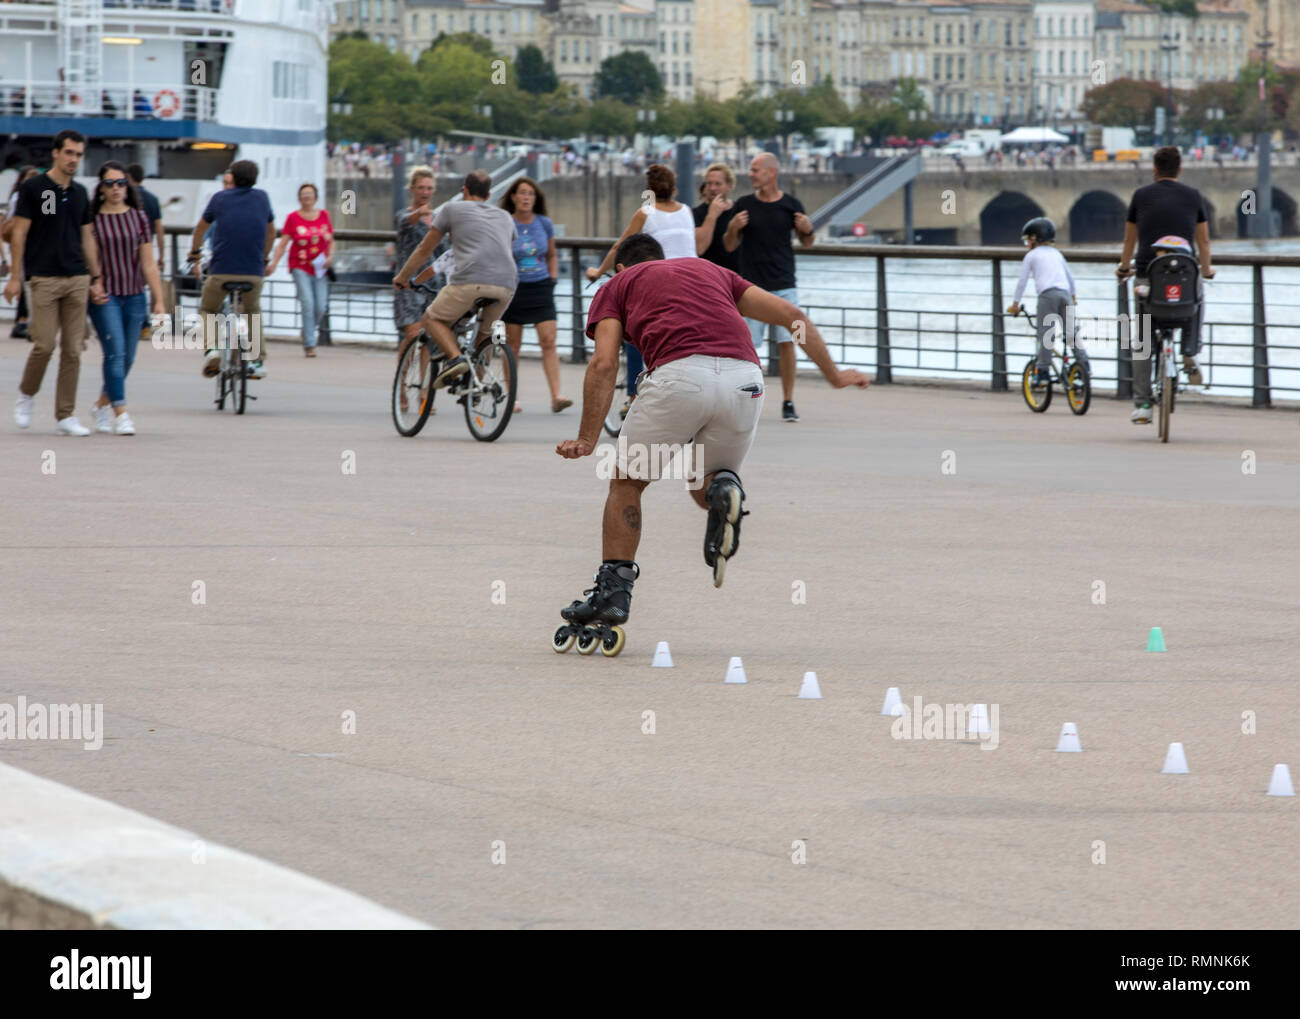 Bordeaux, France - September 9, 2018: Roller skater performs acrobatics in Quai Lousi XVIII in Bordeaux, France Stock Photo